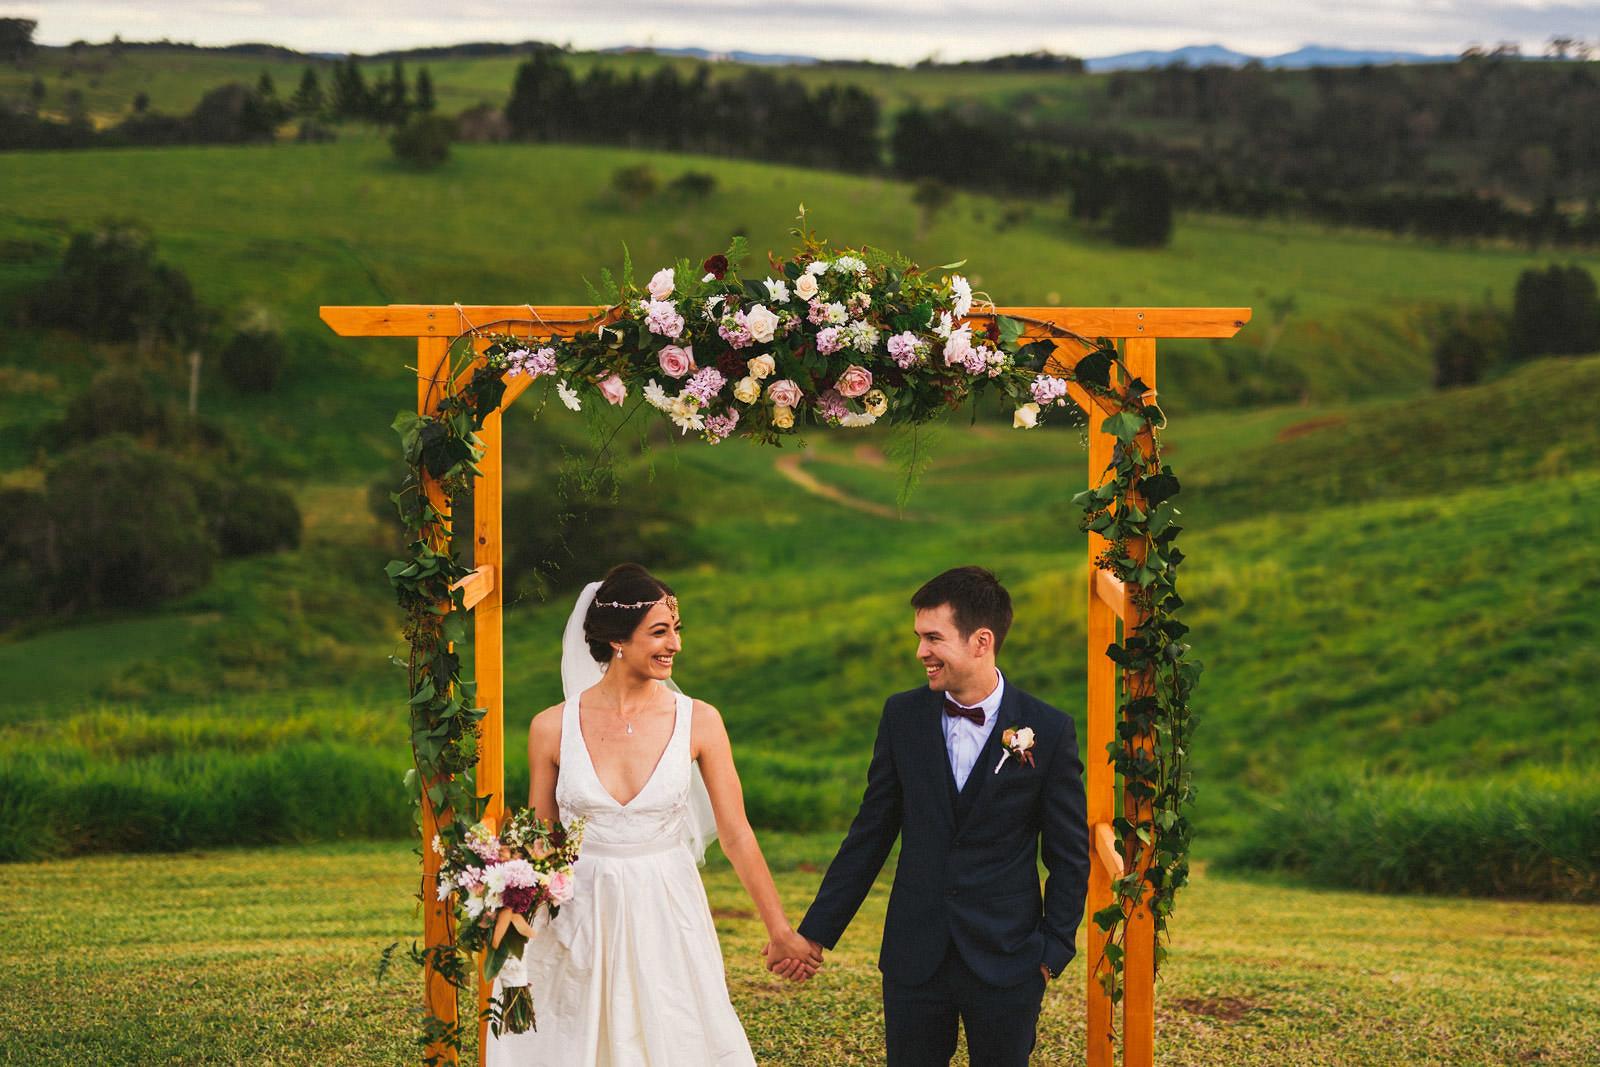 tablelands_wedding_0026